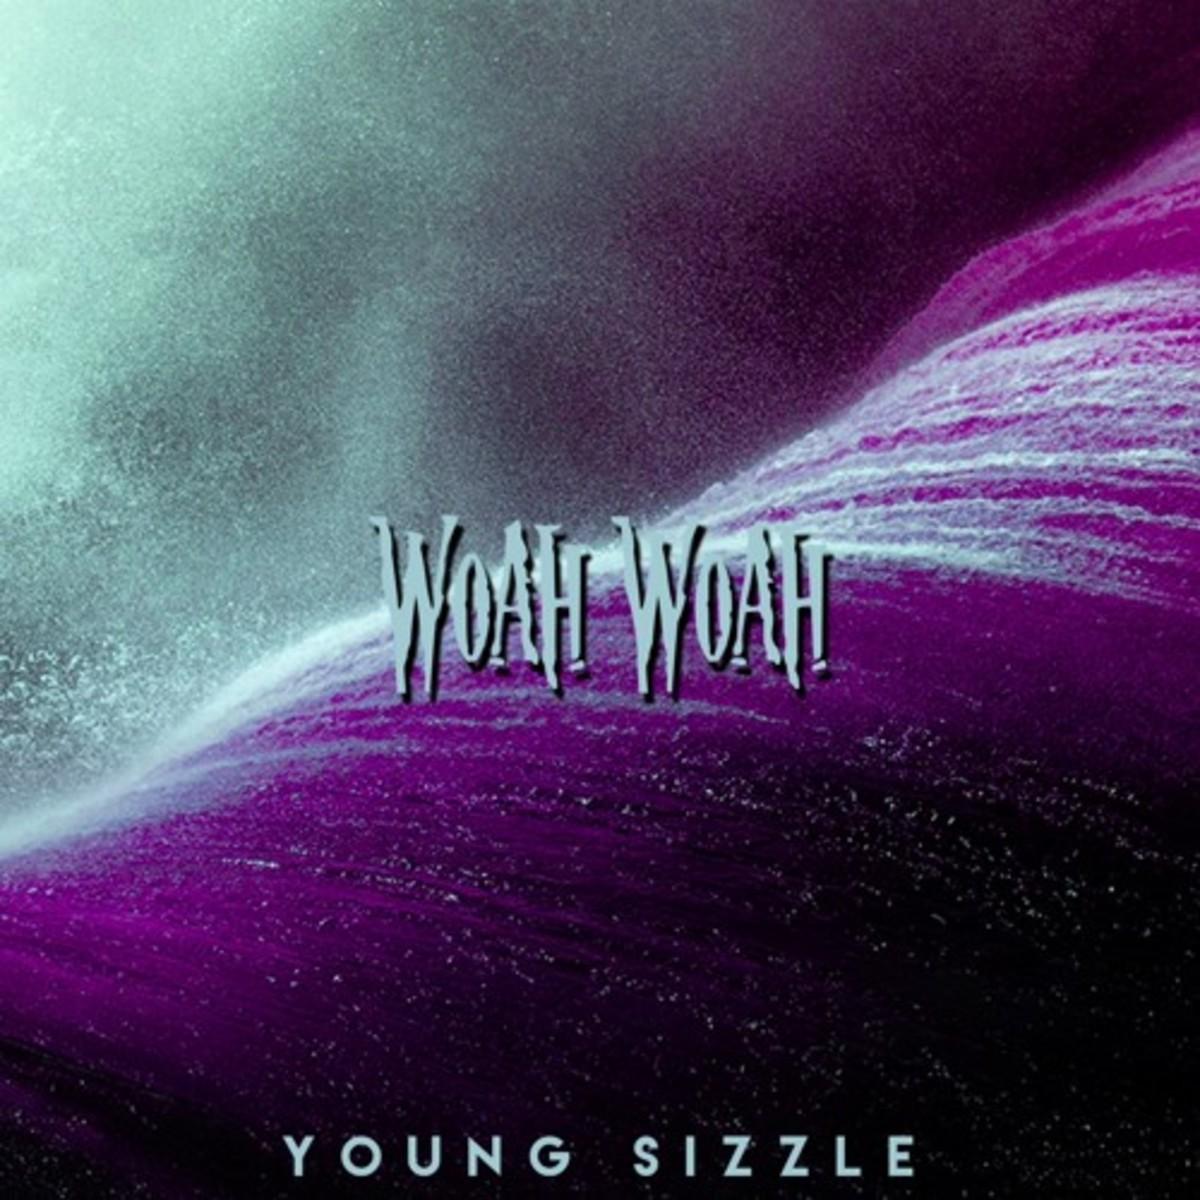 young-sizzle-woah-woah.jpg